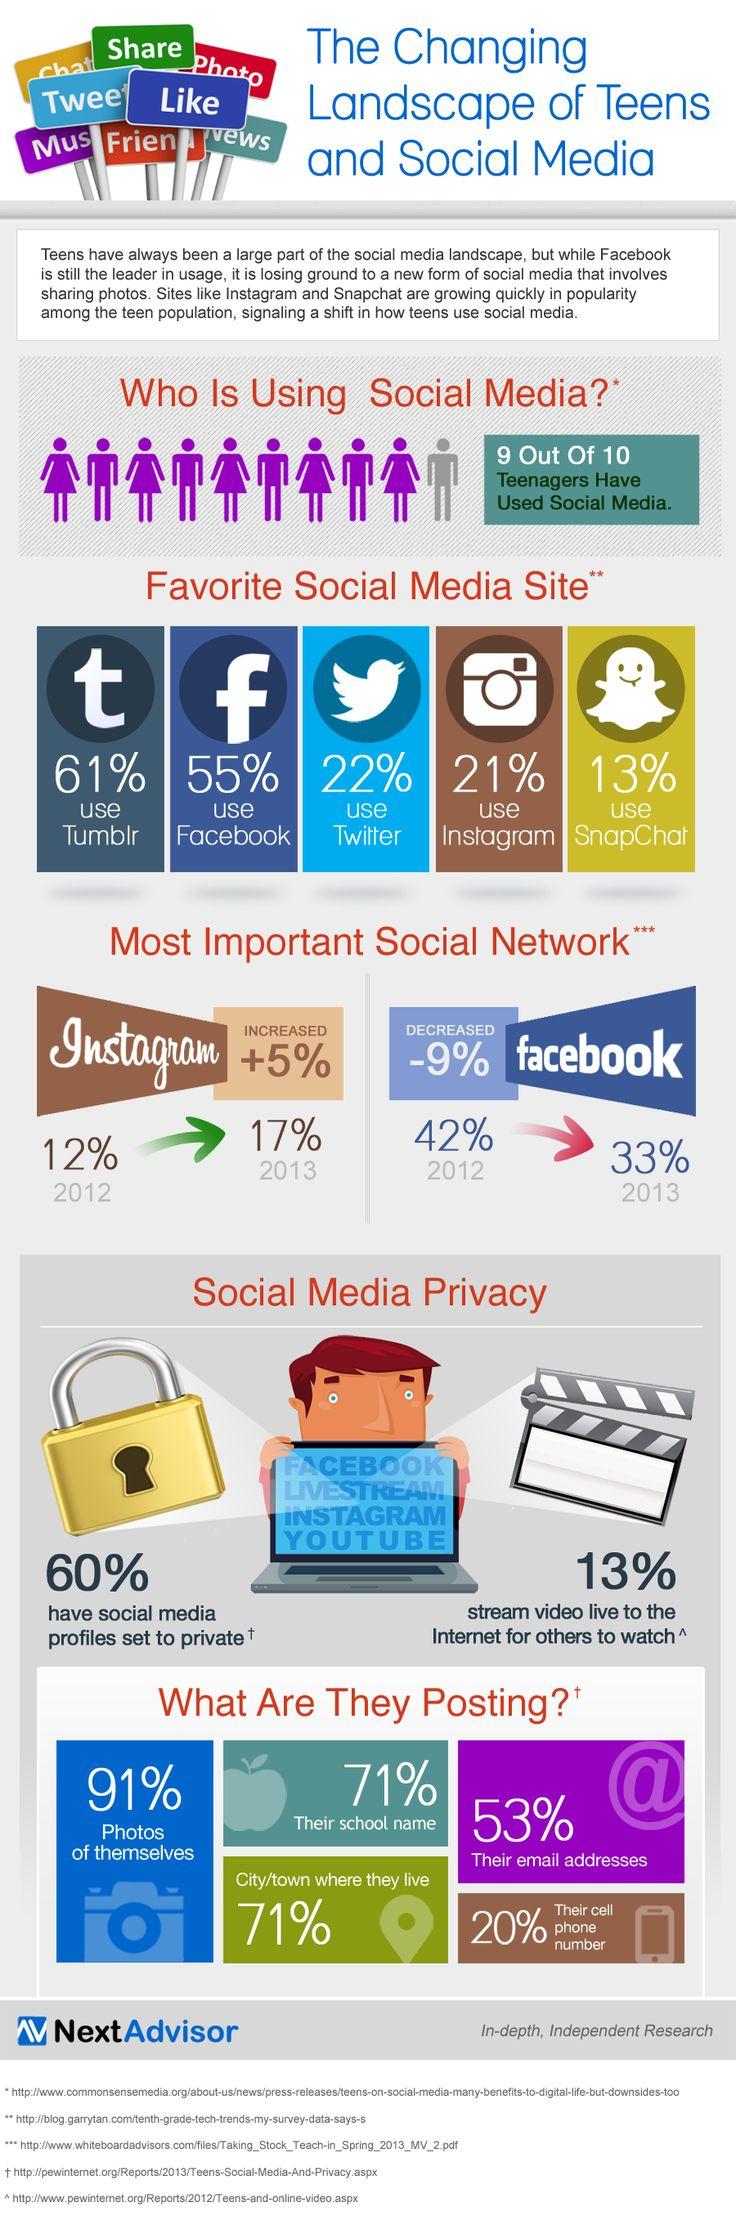 Tumblr, Facebook, Twitter, Instagram & Snapchat - How Teens Use Social Media [INFOGRAPHIC] #digital #social #marketing